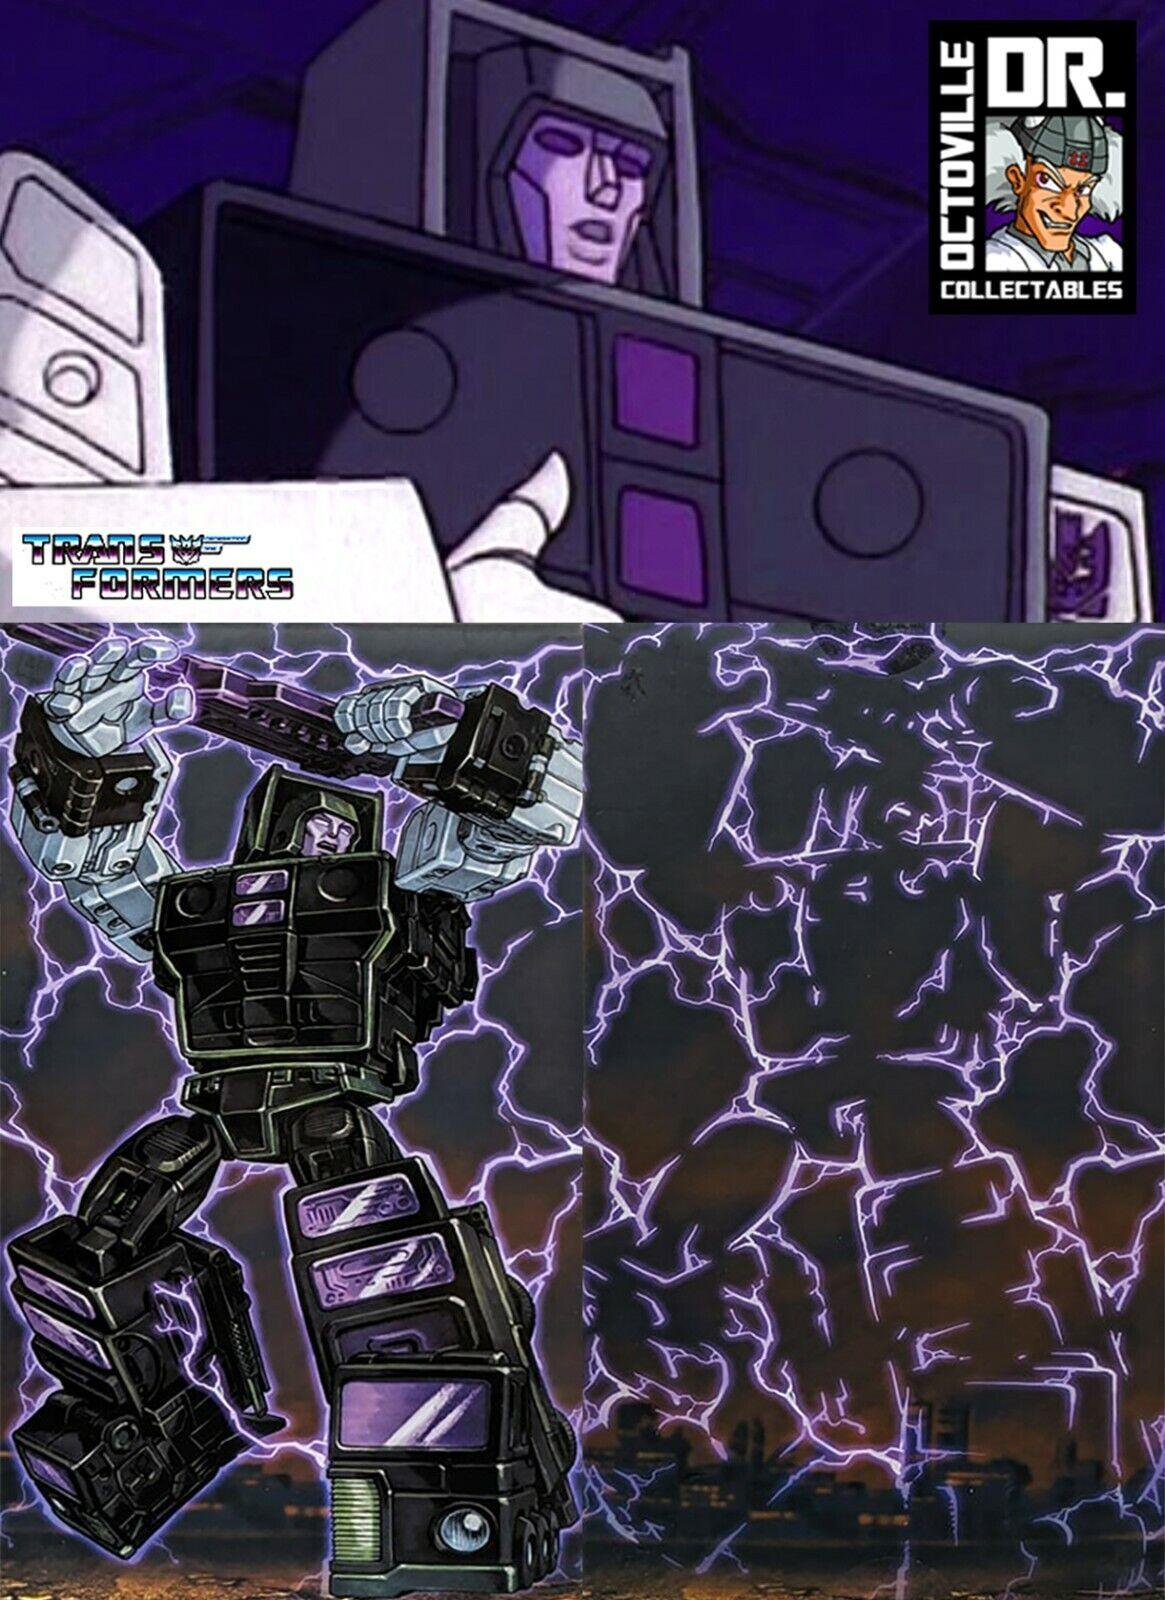 Transformers Masterpiece Xtransbots MXxiia Lapidemotormaster Nuovo di Zecca